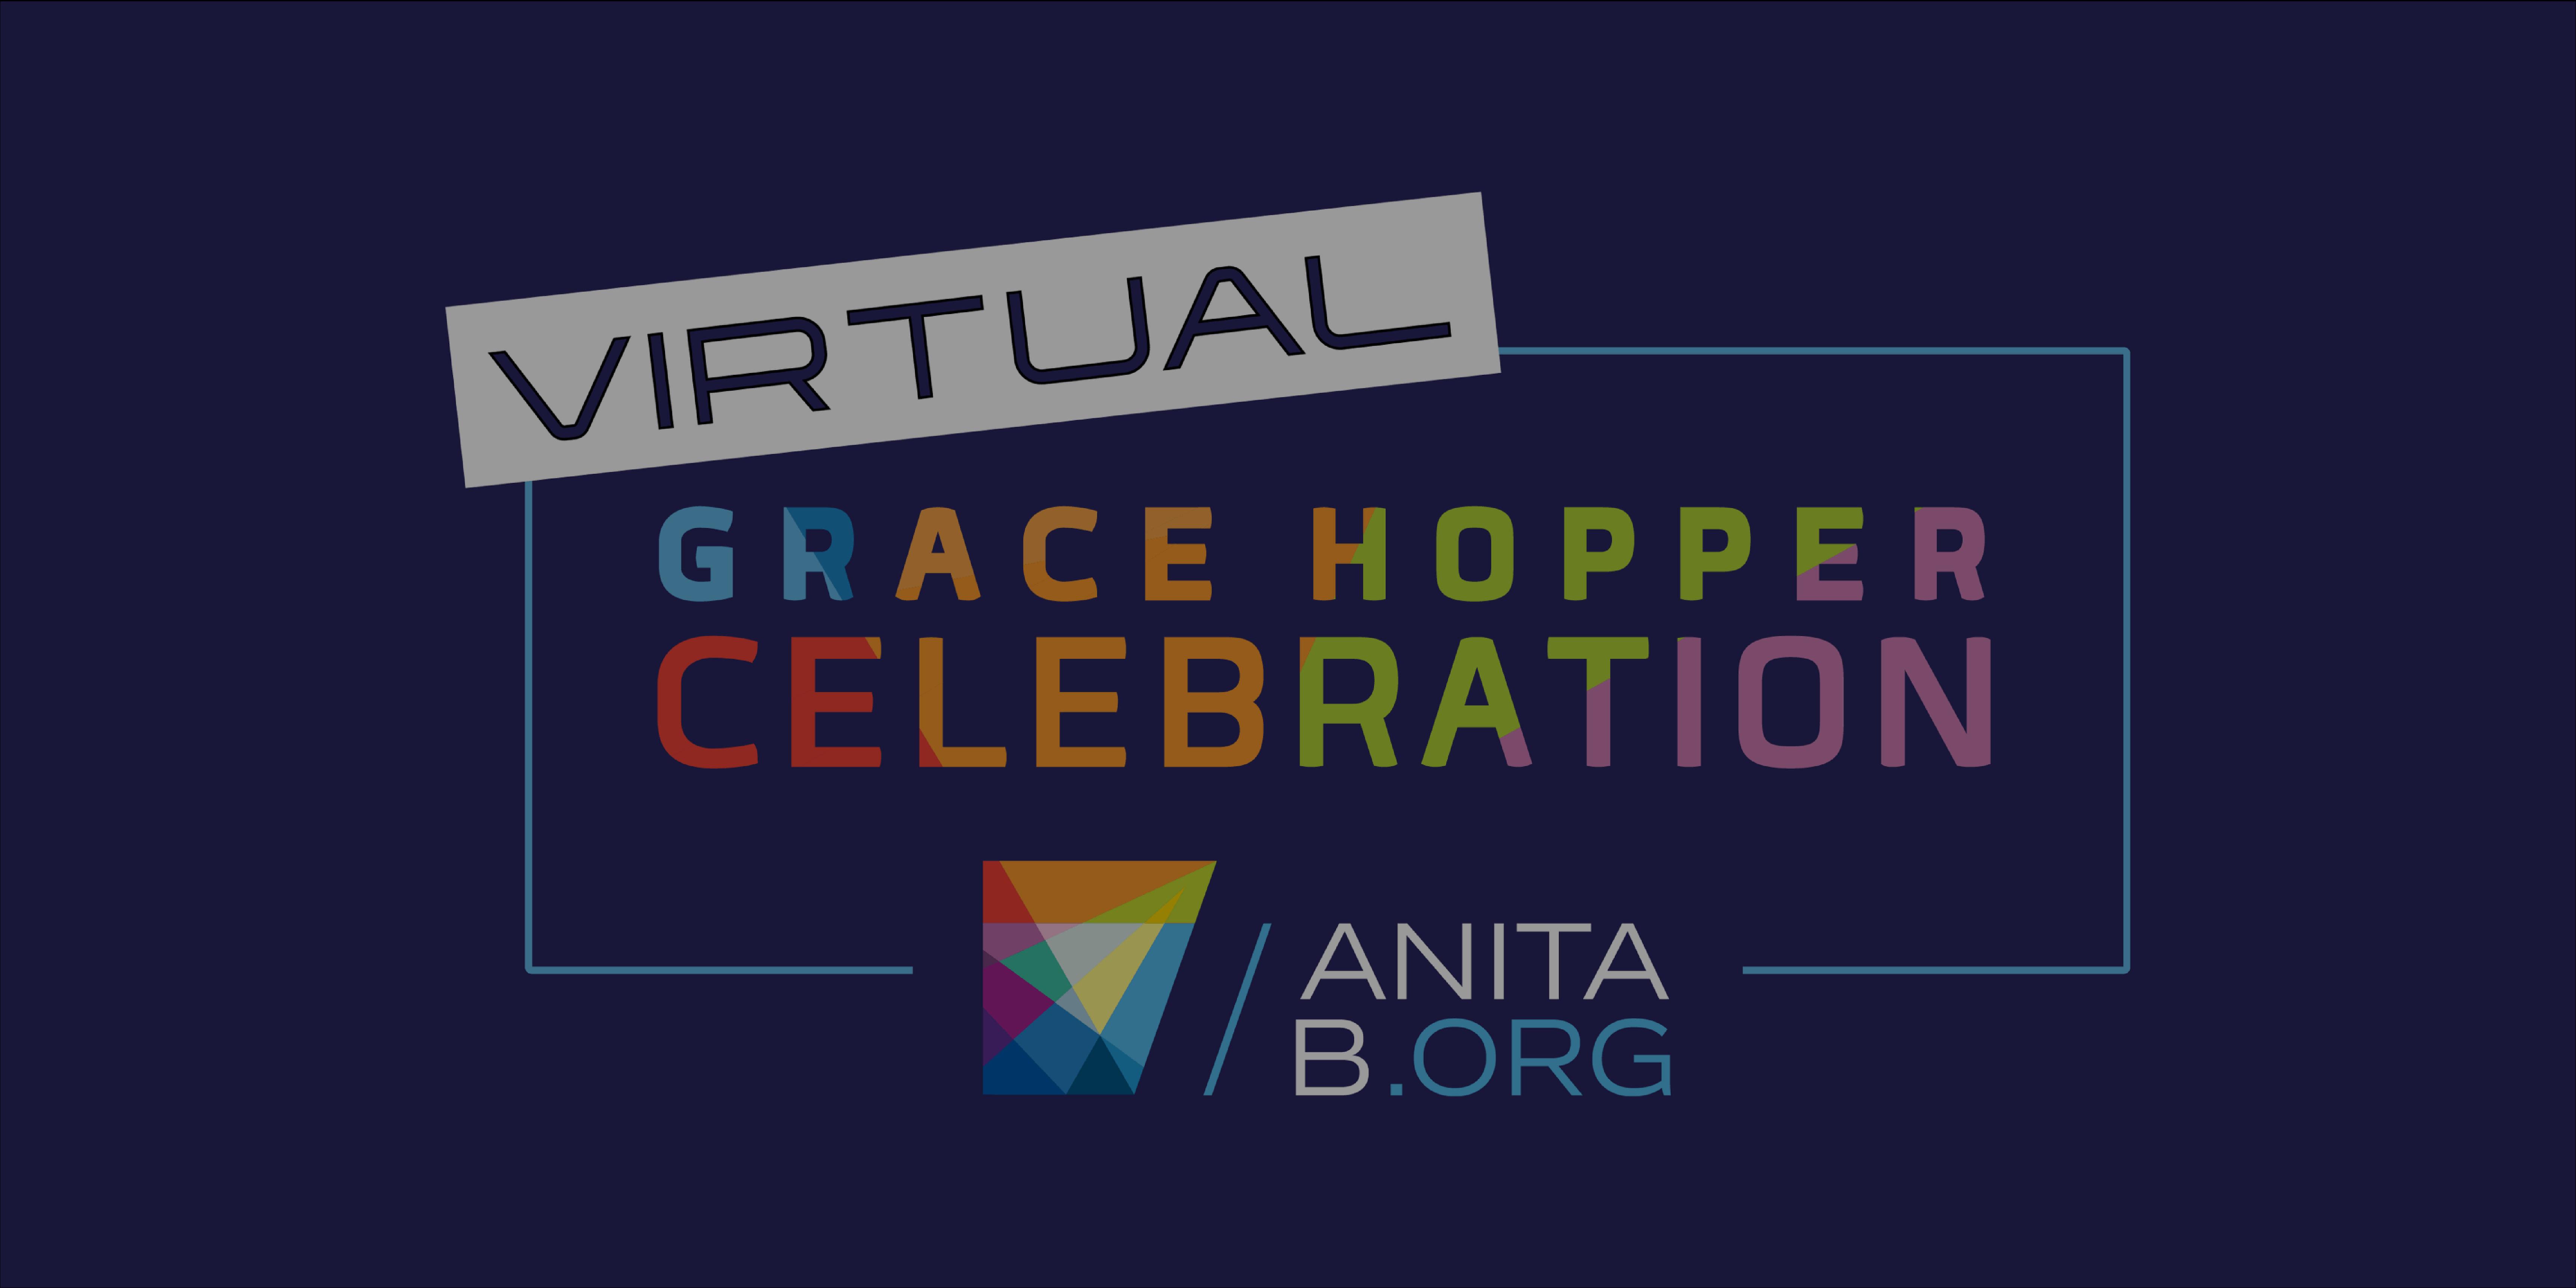 Digital Forensic Breadcrumbs at the 2020 Grace Hopper Celebration